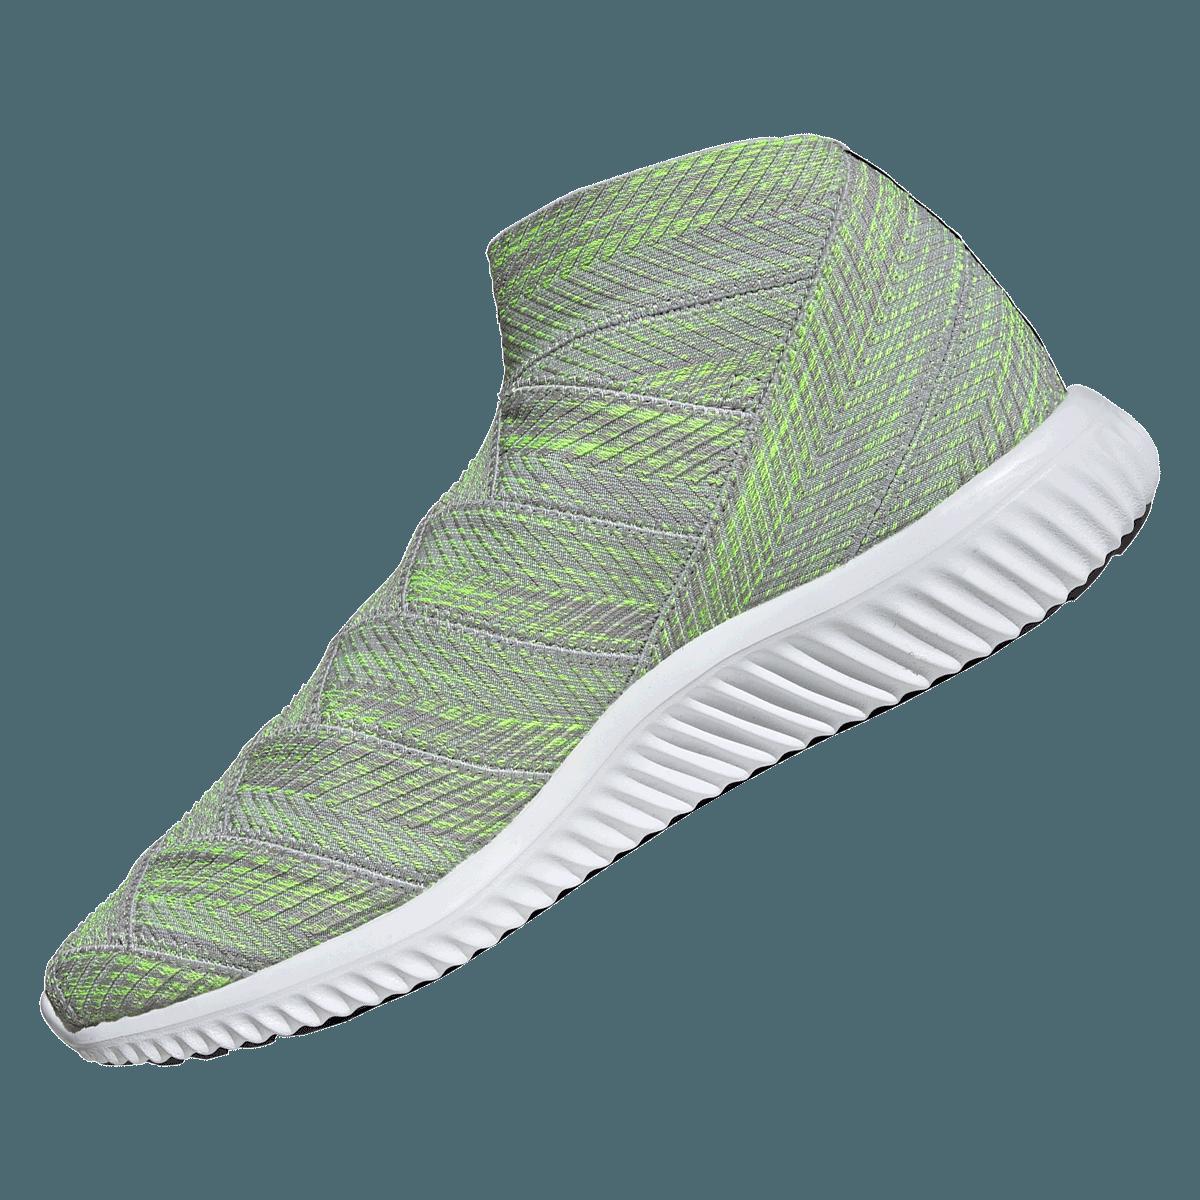 adidas schoenen Nemeziz 18.1 TR groenzwart Voetbal shop